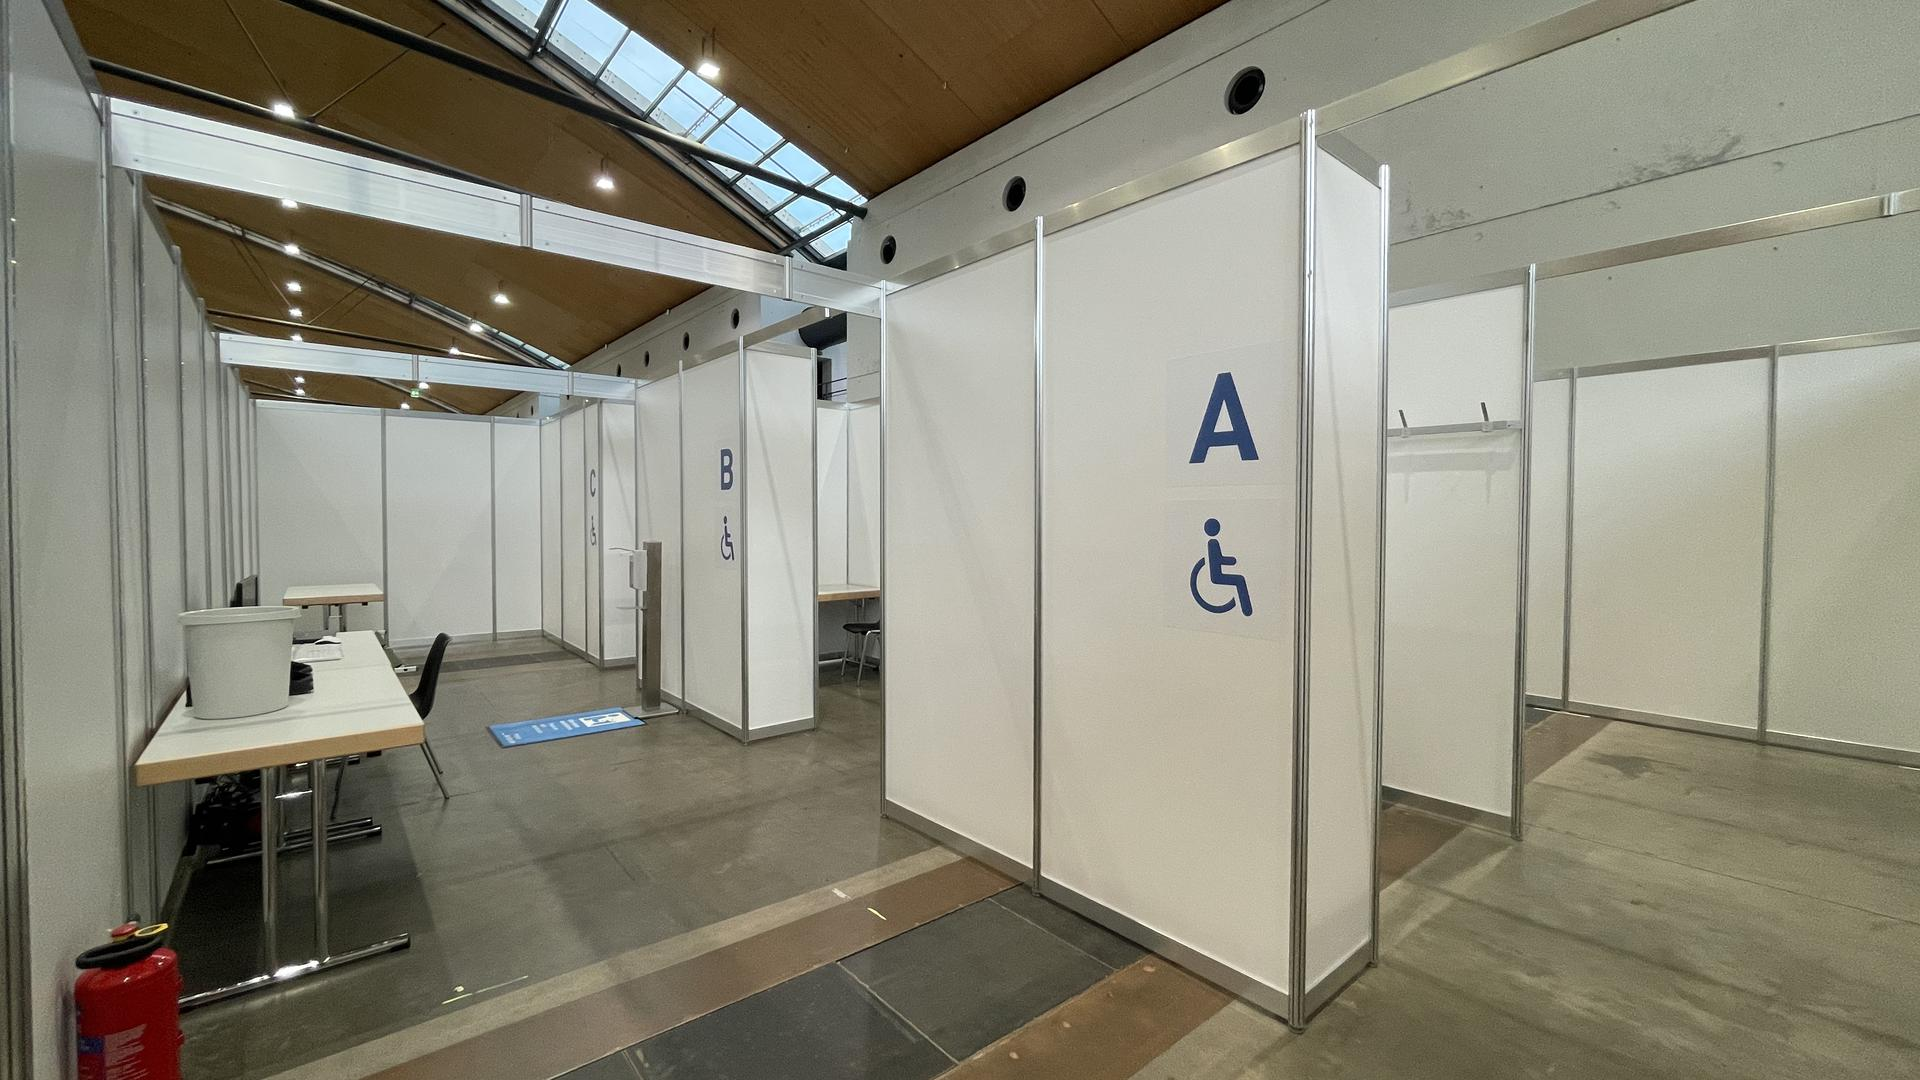 Arzt-Praxis Impfzentrum Messe Karlsruhe